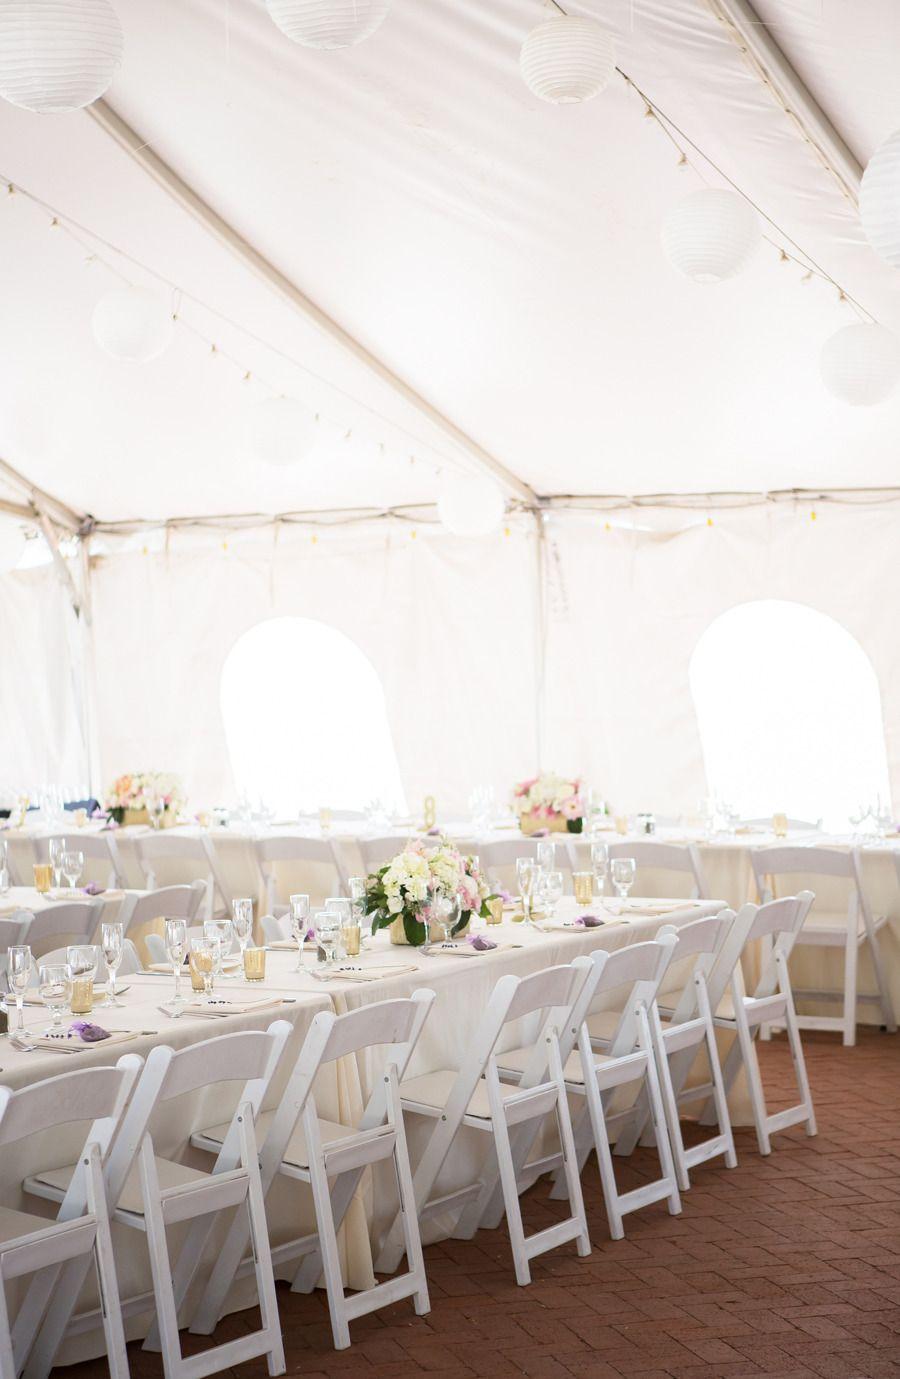 Photography: Ryon:Lockhart Photography - www.ryonlockhart.com  Read More: http://www.stylemepretty.com/california-weddings/2014/10/01/rustic-elegant-wedding-in-the-lavender-fields-of-highland-springs-resort/